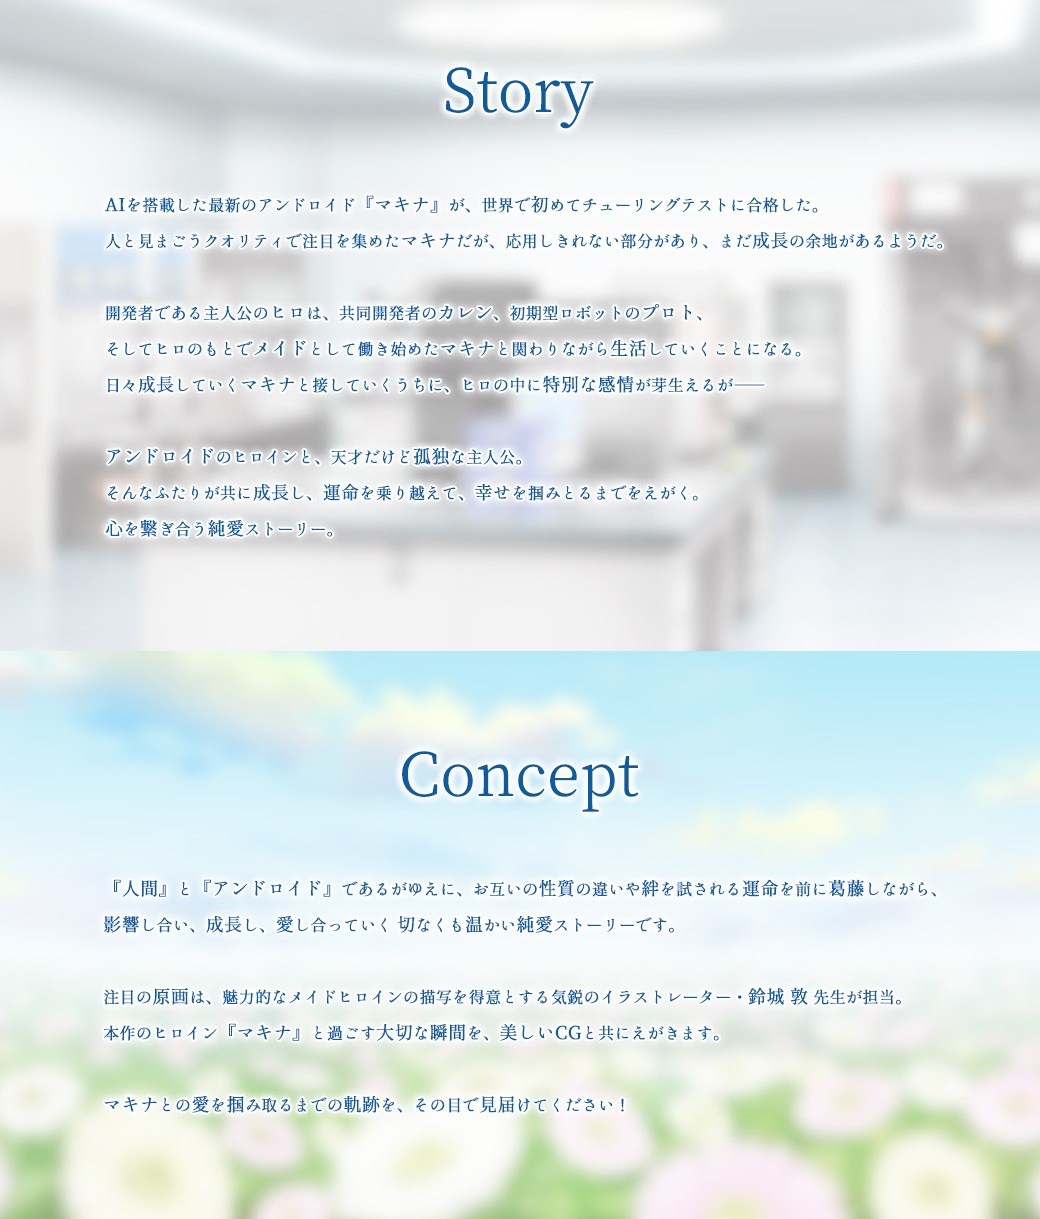 story_20200312191233034.jpg